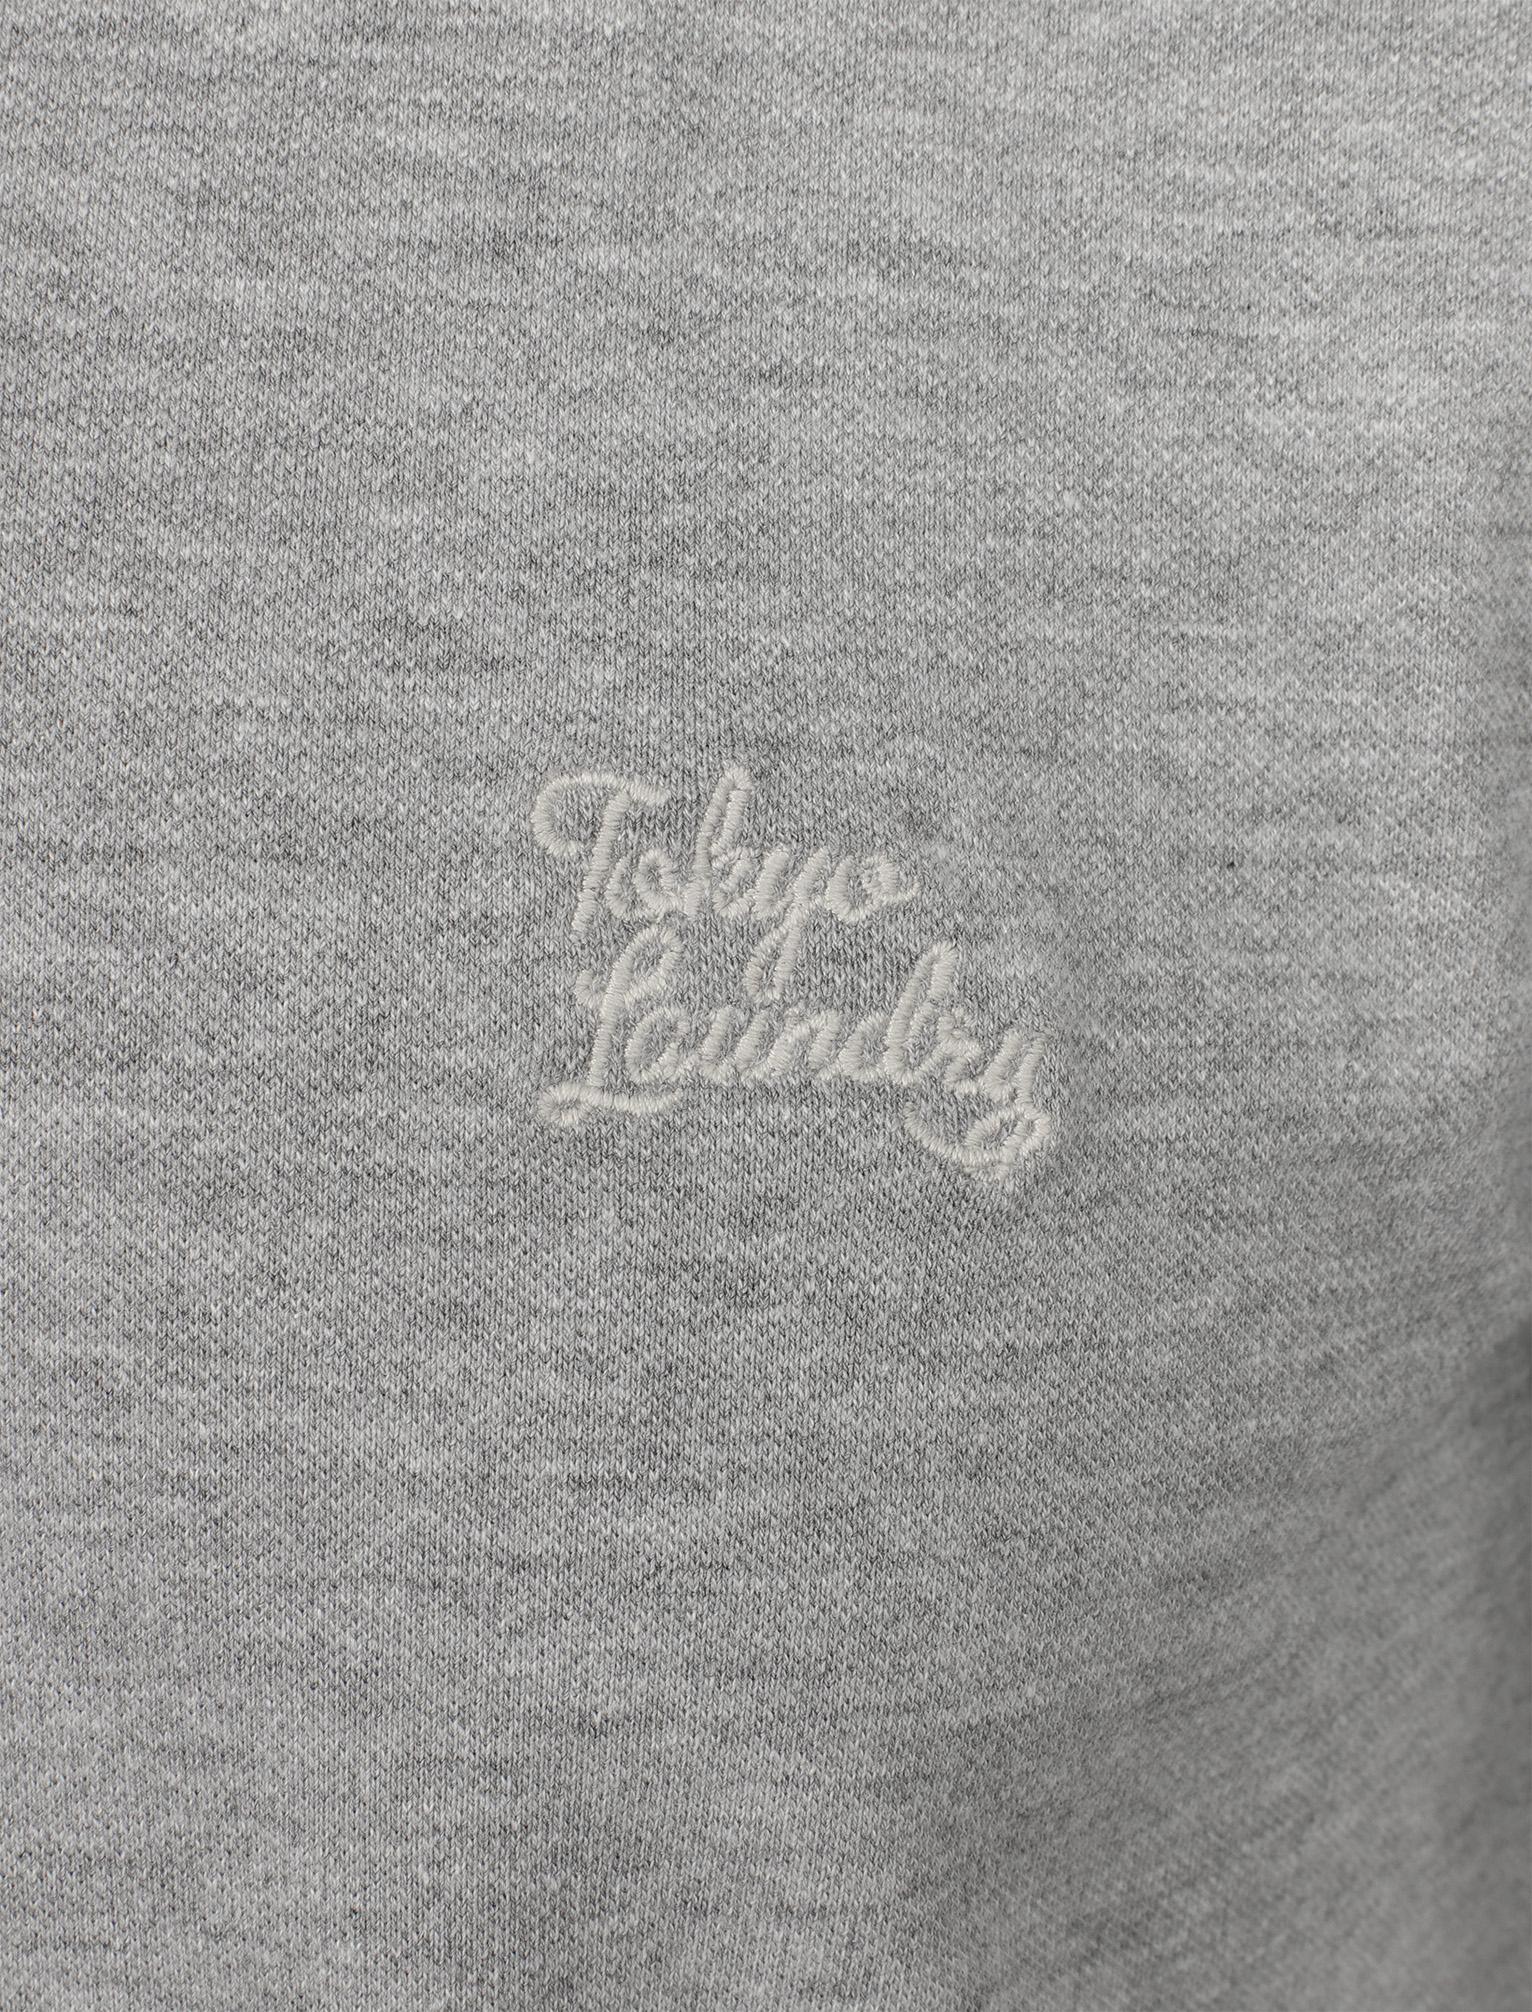 New-Mens-Tokyo-Laundry-Branded-Kuusamo-Cotton-Rich-Pique-Polo-Shirt-Size-S-XXL thumbnail 6